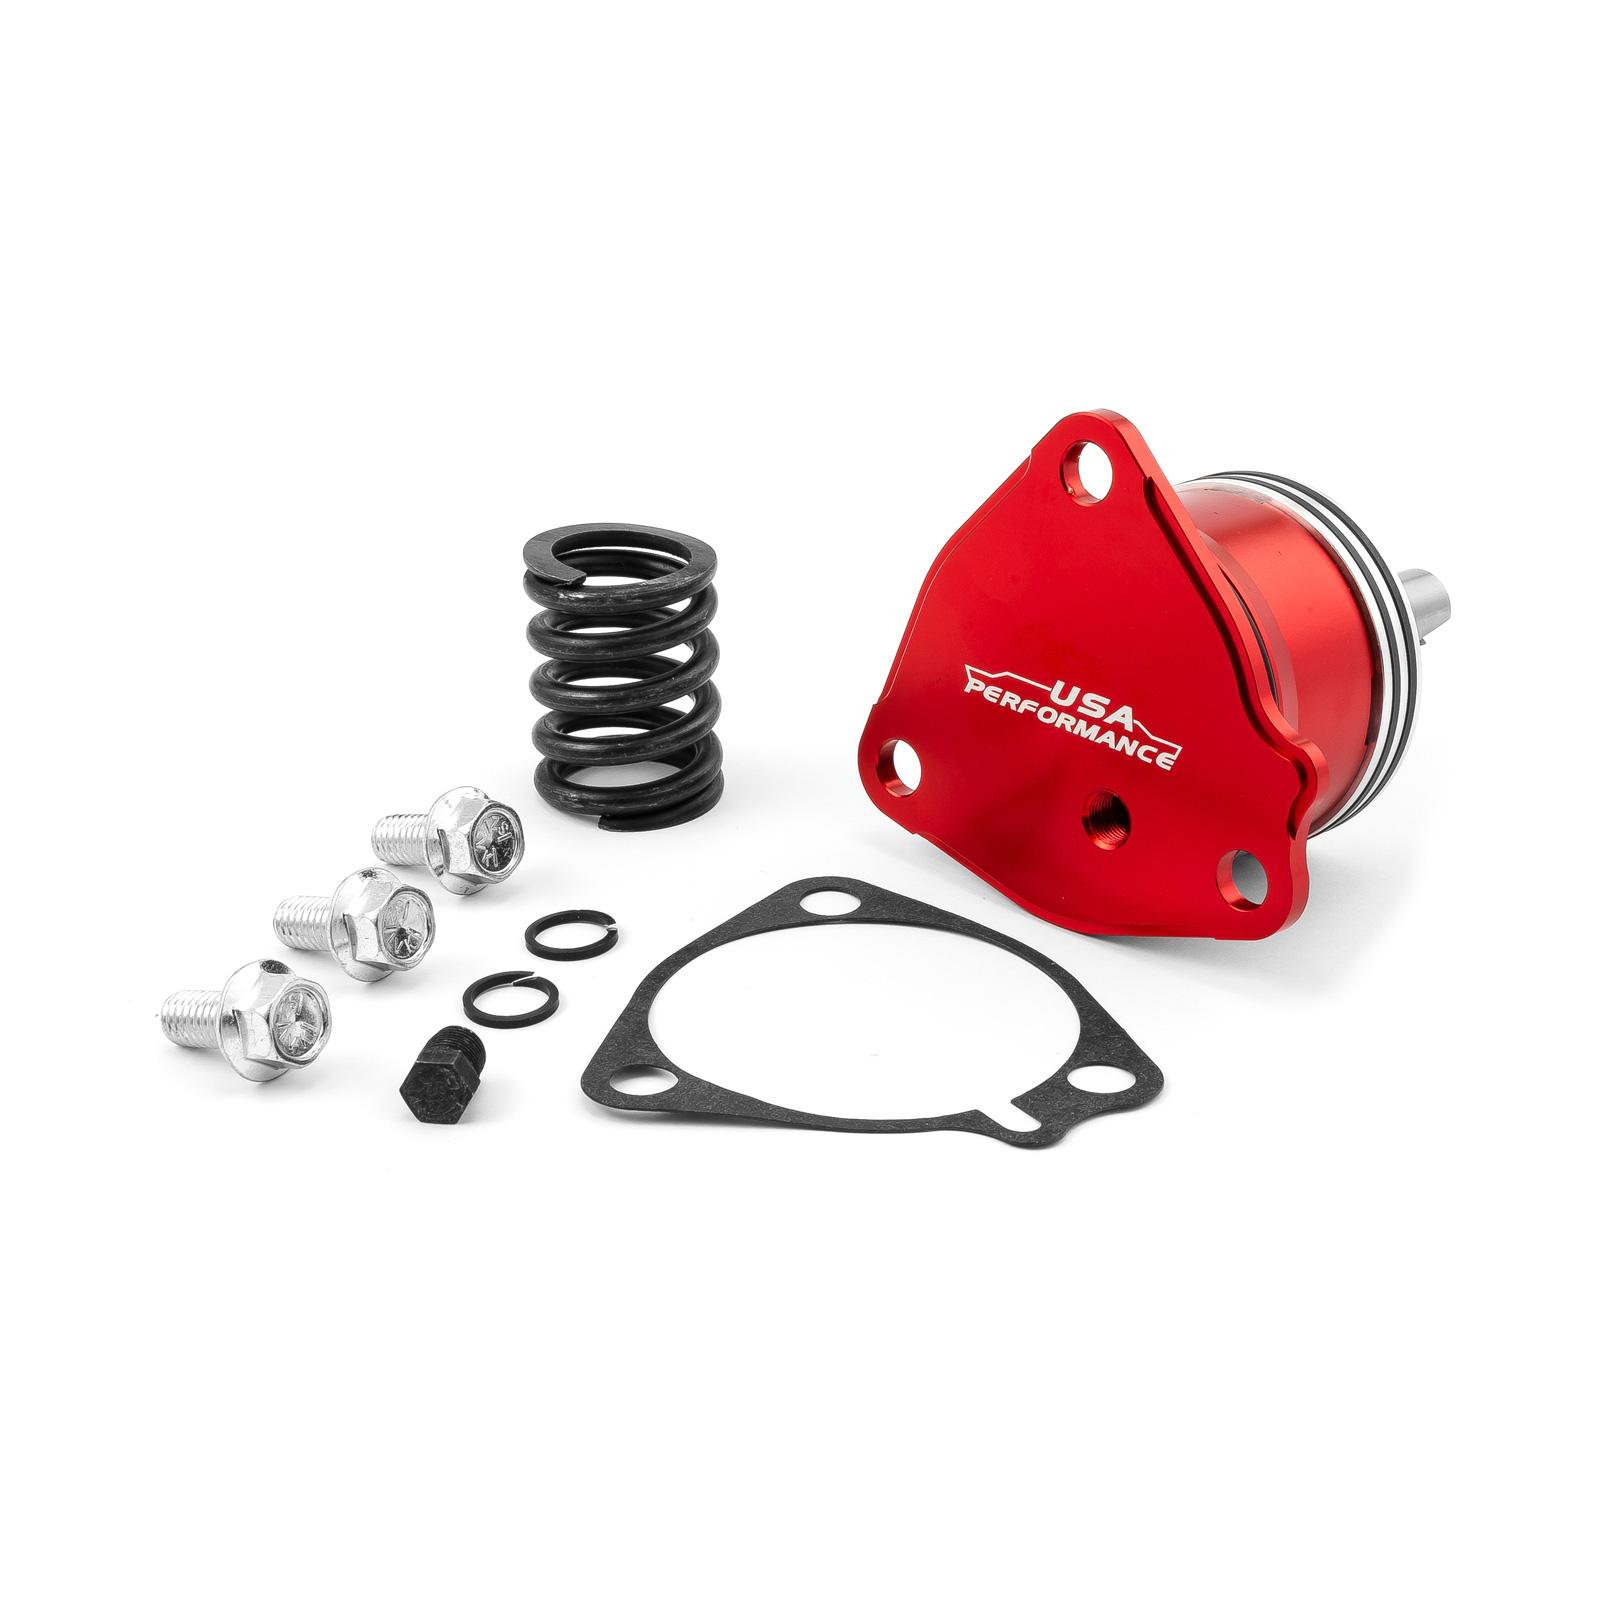 GM Powerglide Automatic Transmission Billet 1st Gear Servo Piston Kit [Red]